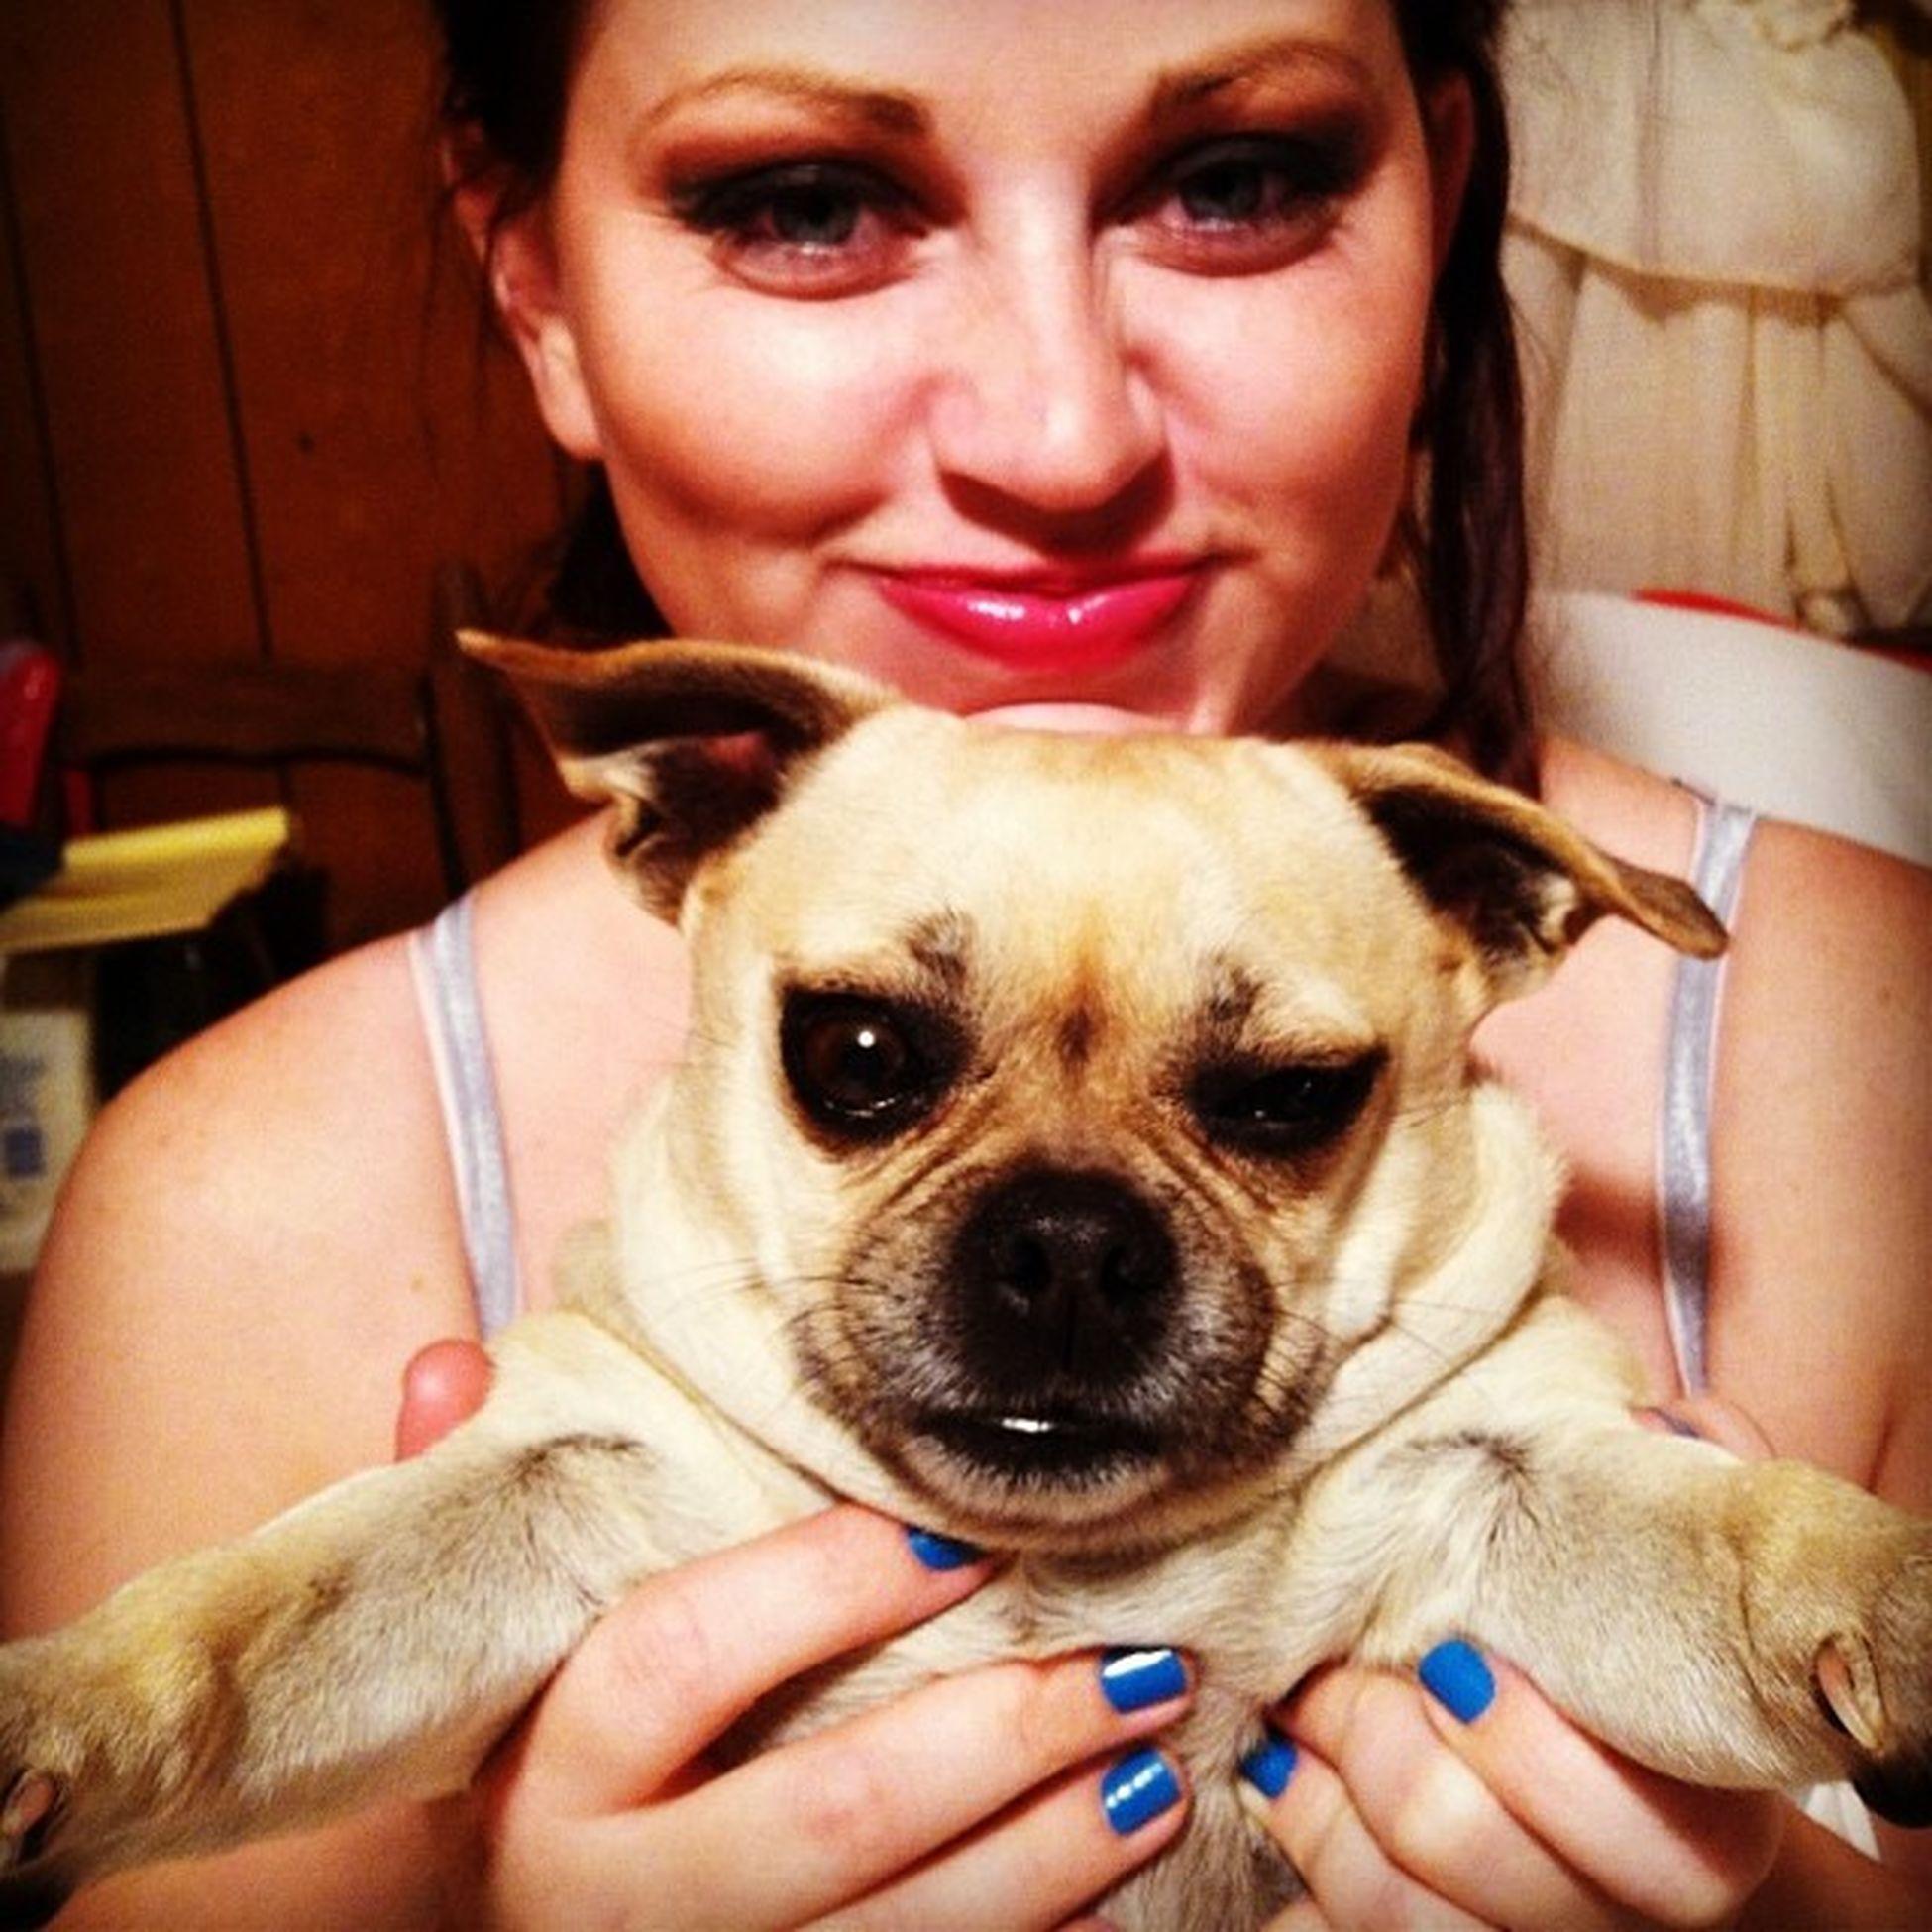 Pug just wants to hug! She kinda looks like UncleRuckus